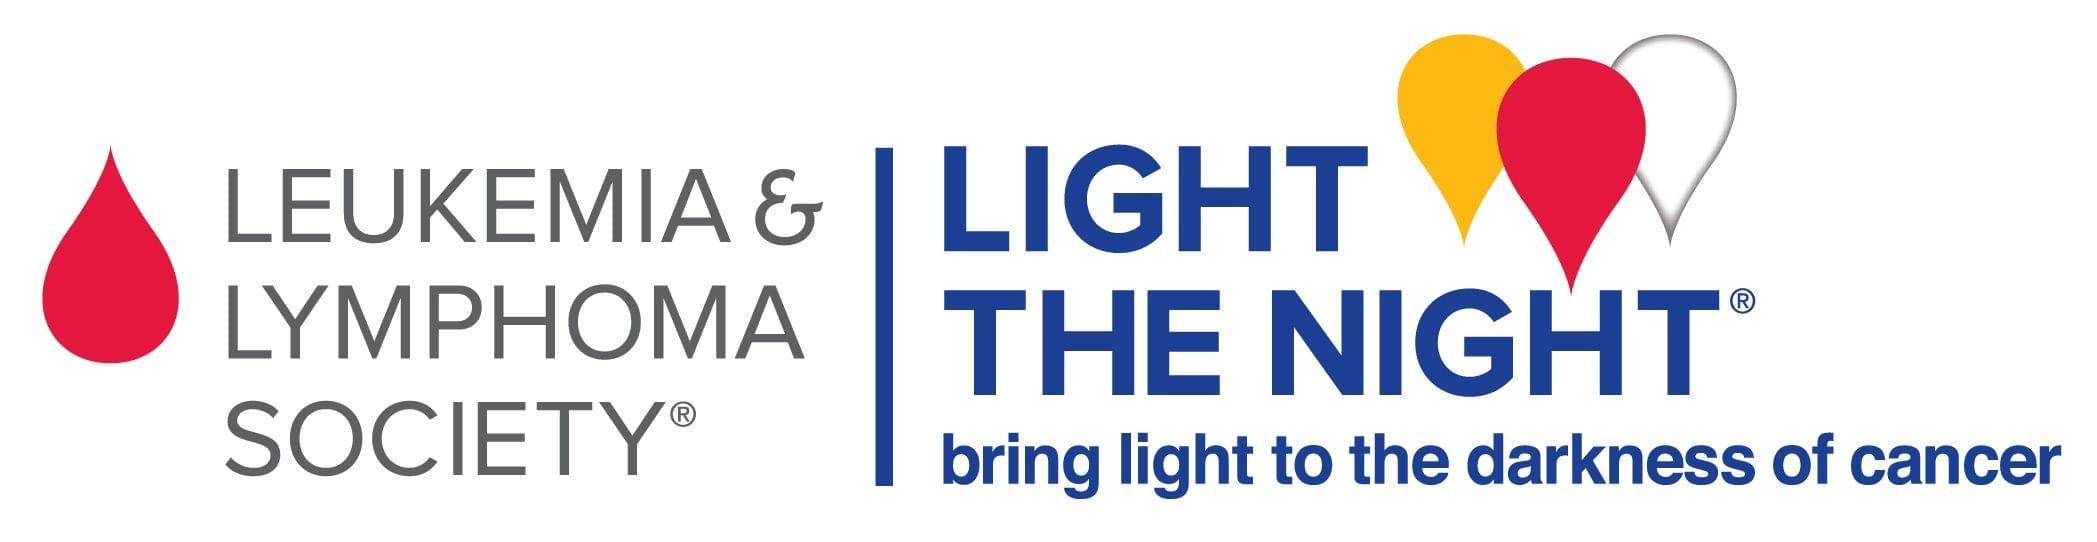 Light the Night logo